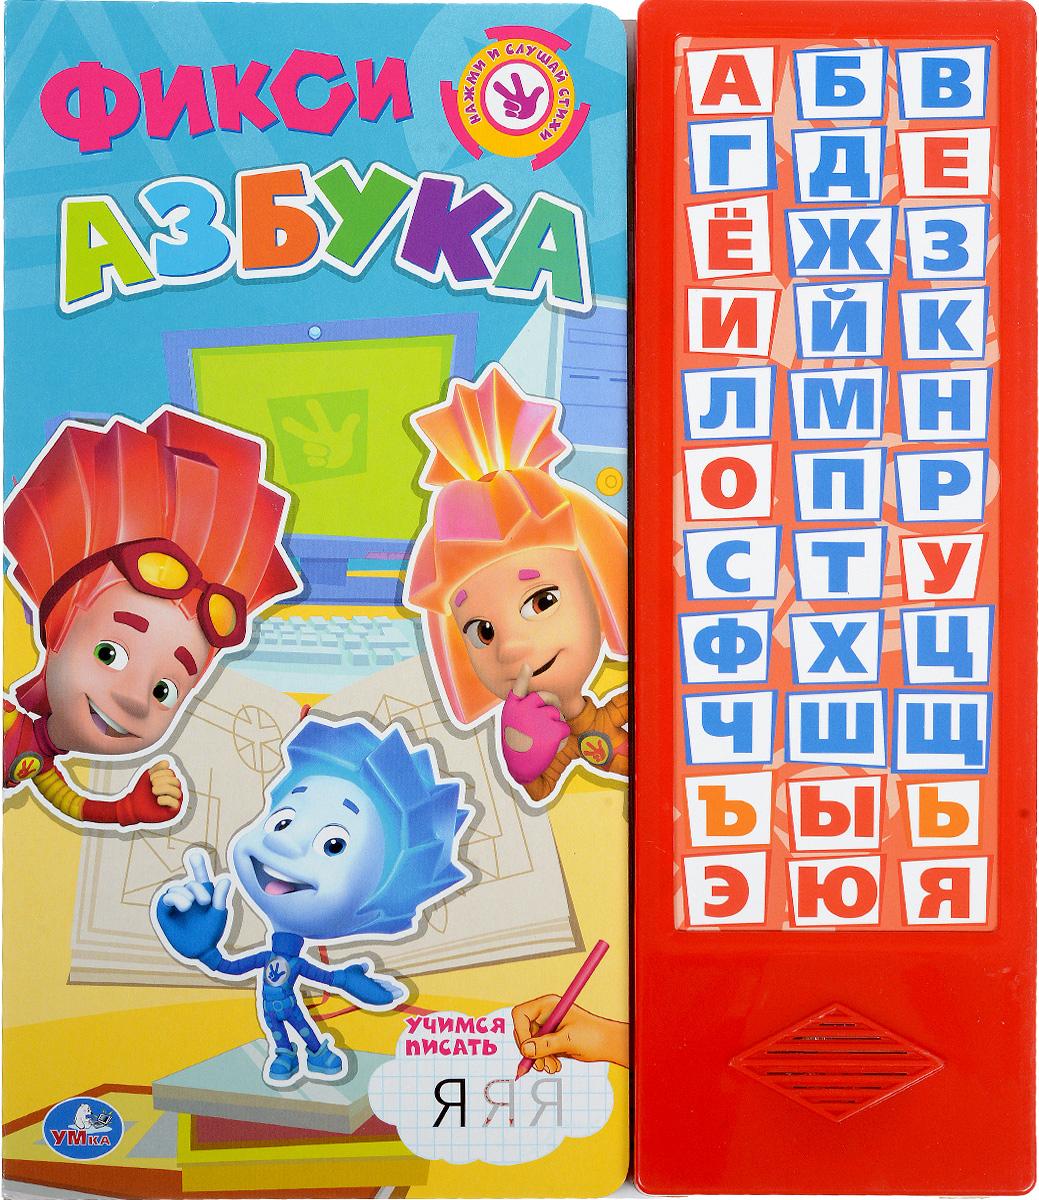 Умка. Фиксики. Фикси-Азбука. (33 Звуковые Кнопки). коненкина г ред учим буквы от а до я учим цифры от 1 до 10 веселый счет азбука в стихах и картинках